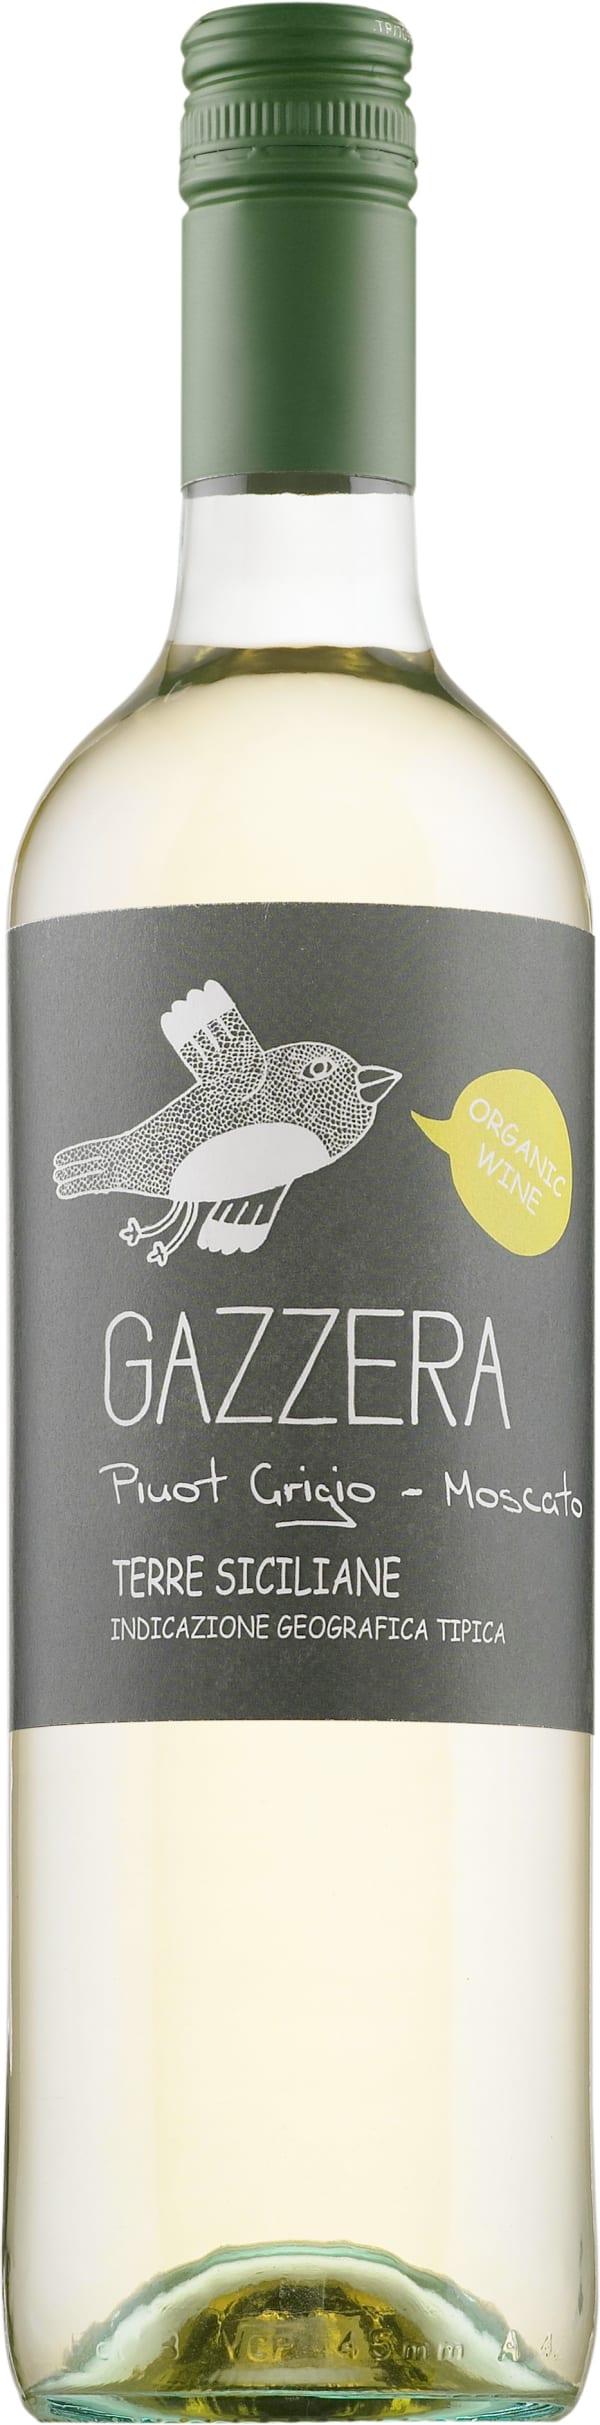 Gazzera Pinot Grigio Moscato Organic 2016